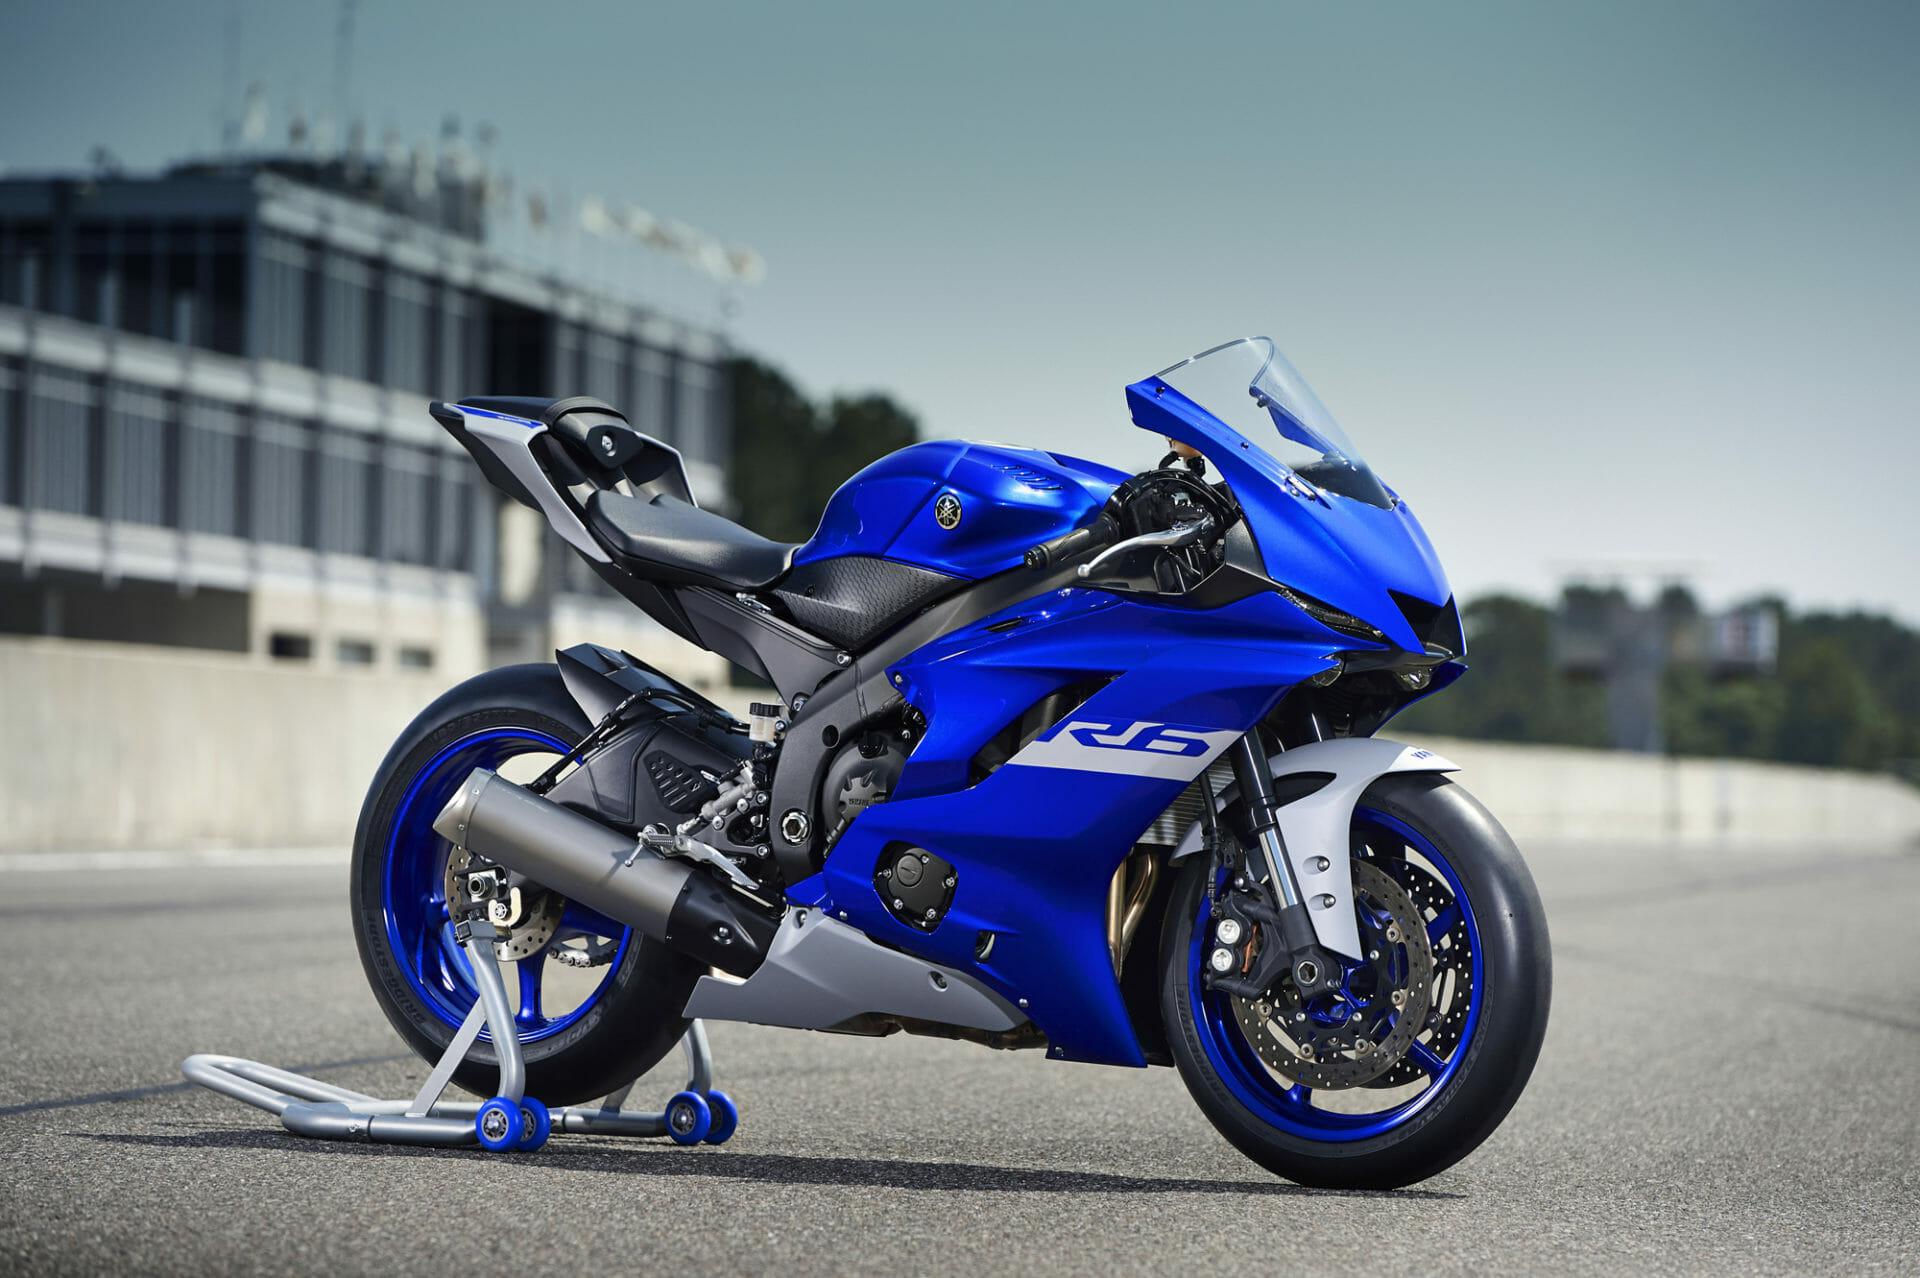 Motorrad Occasion Yamaha MT-09 kaufen